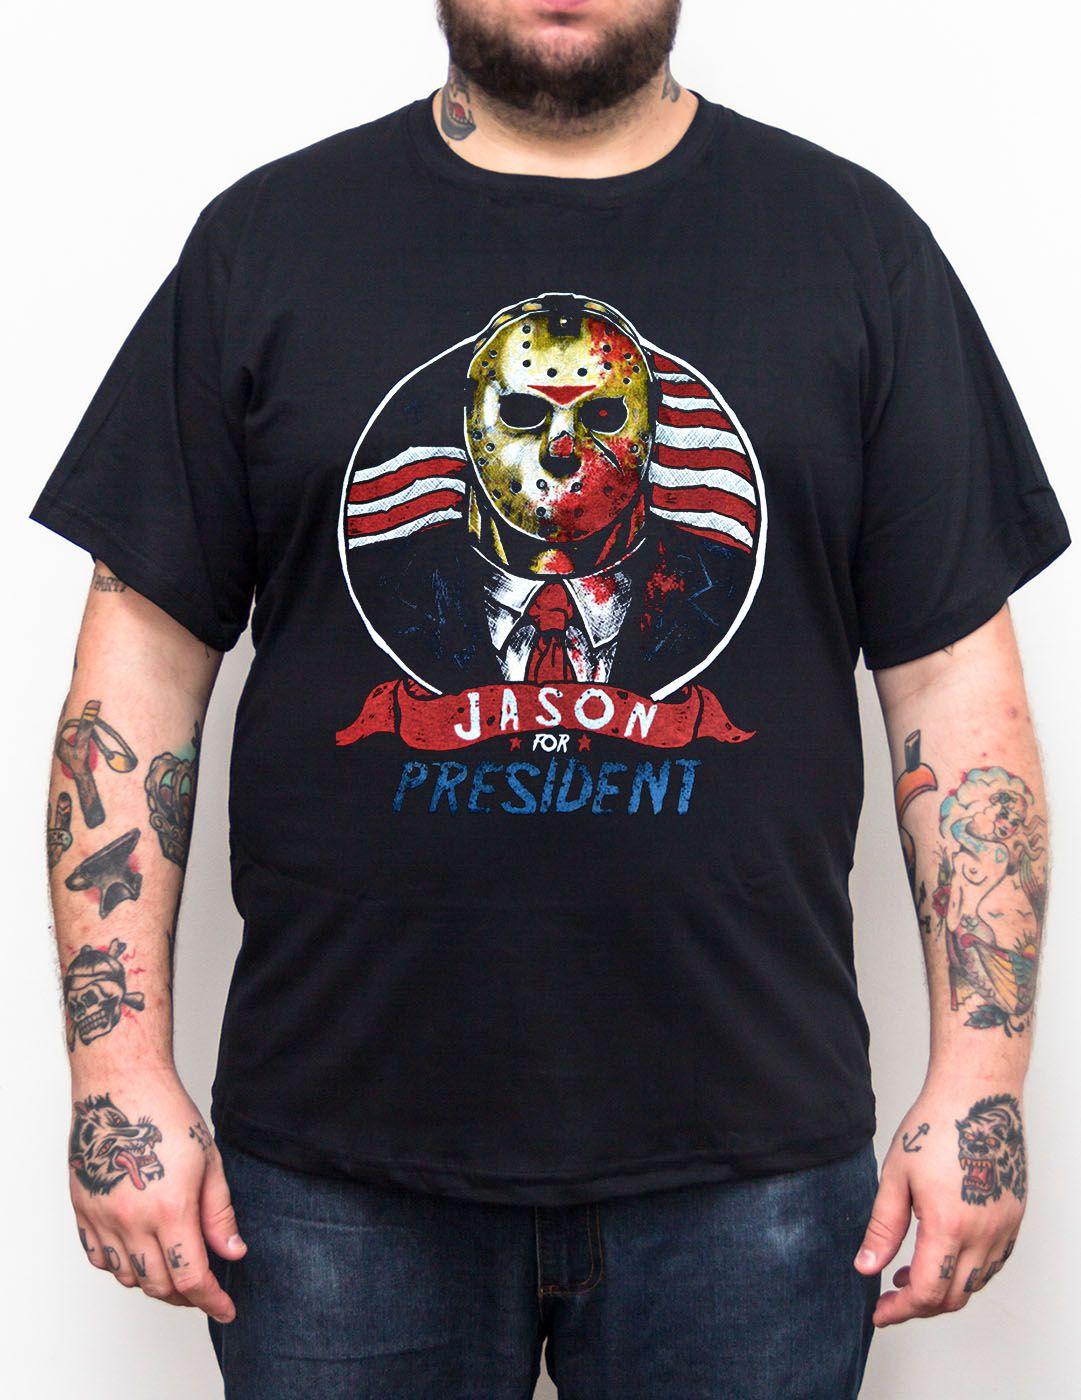 Camiseta Jason for President - Tamanho Grande Xg  - HShop